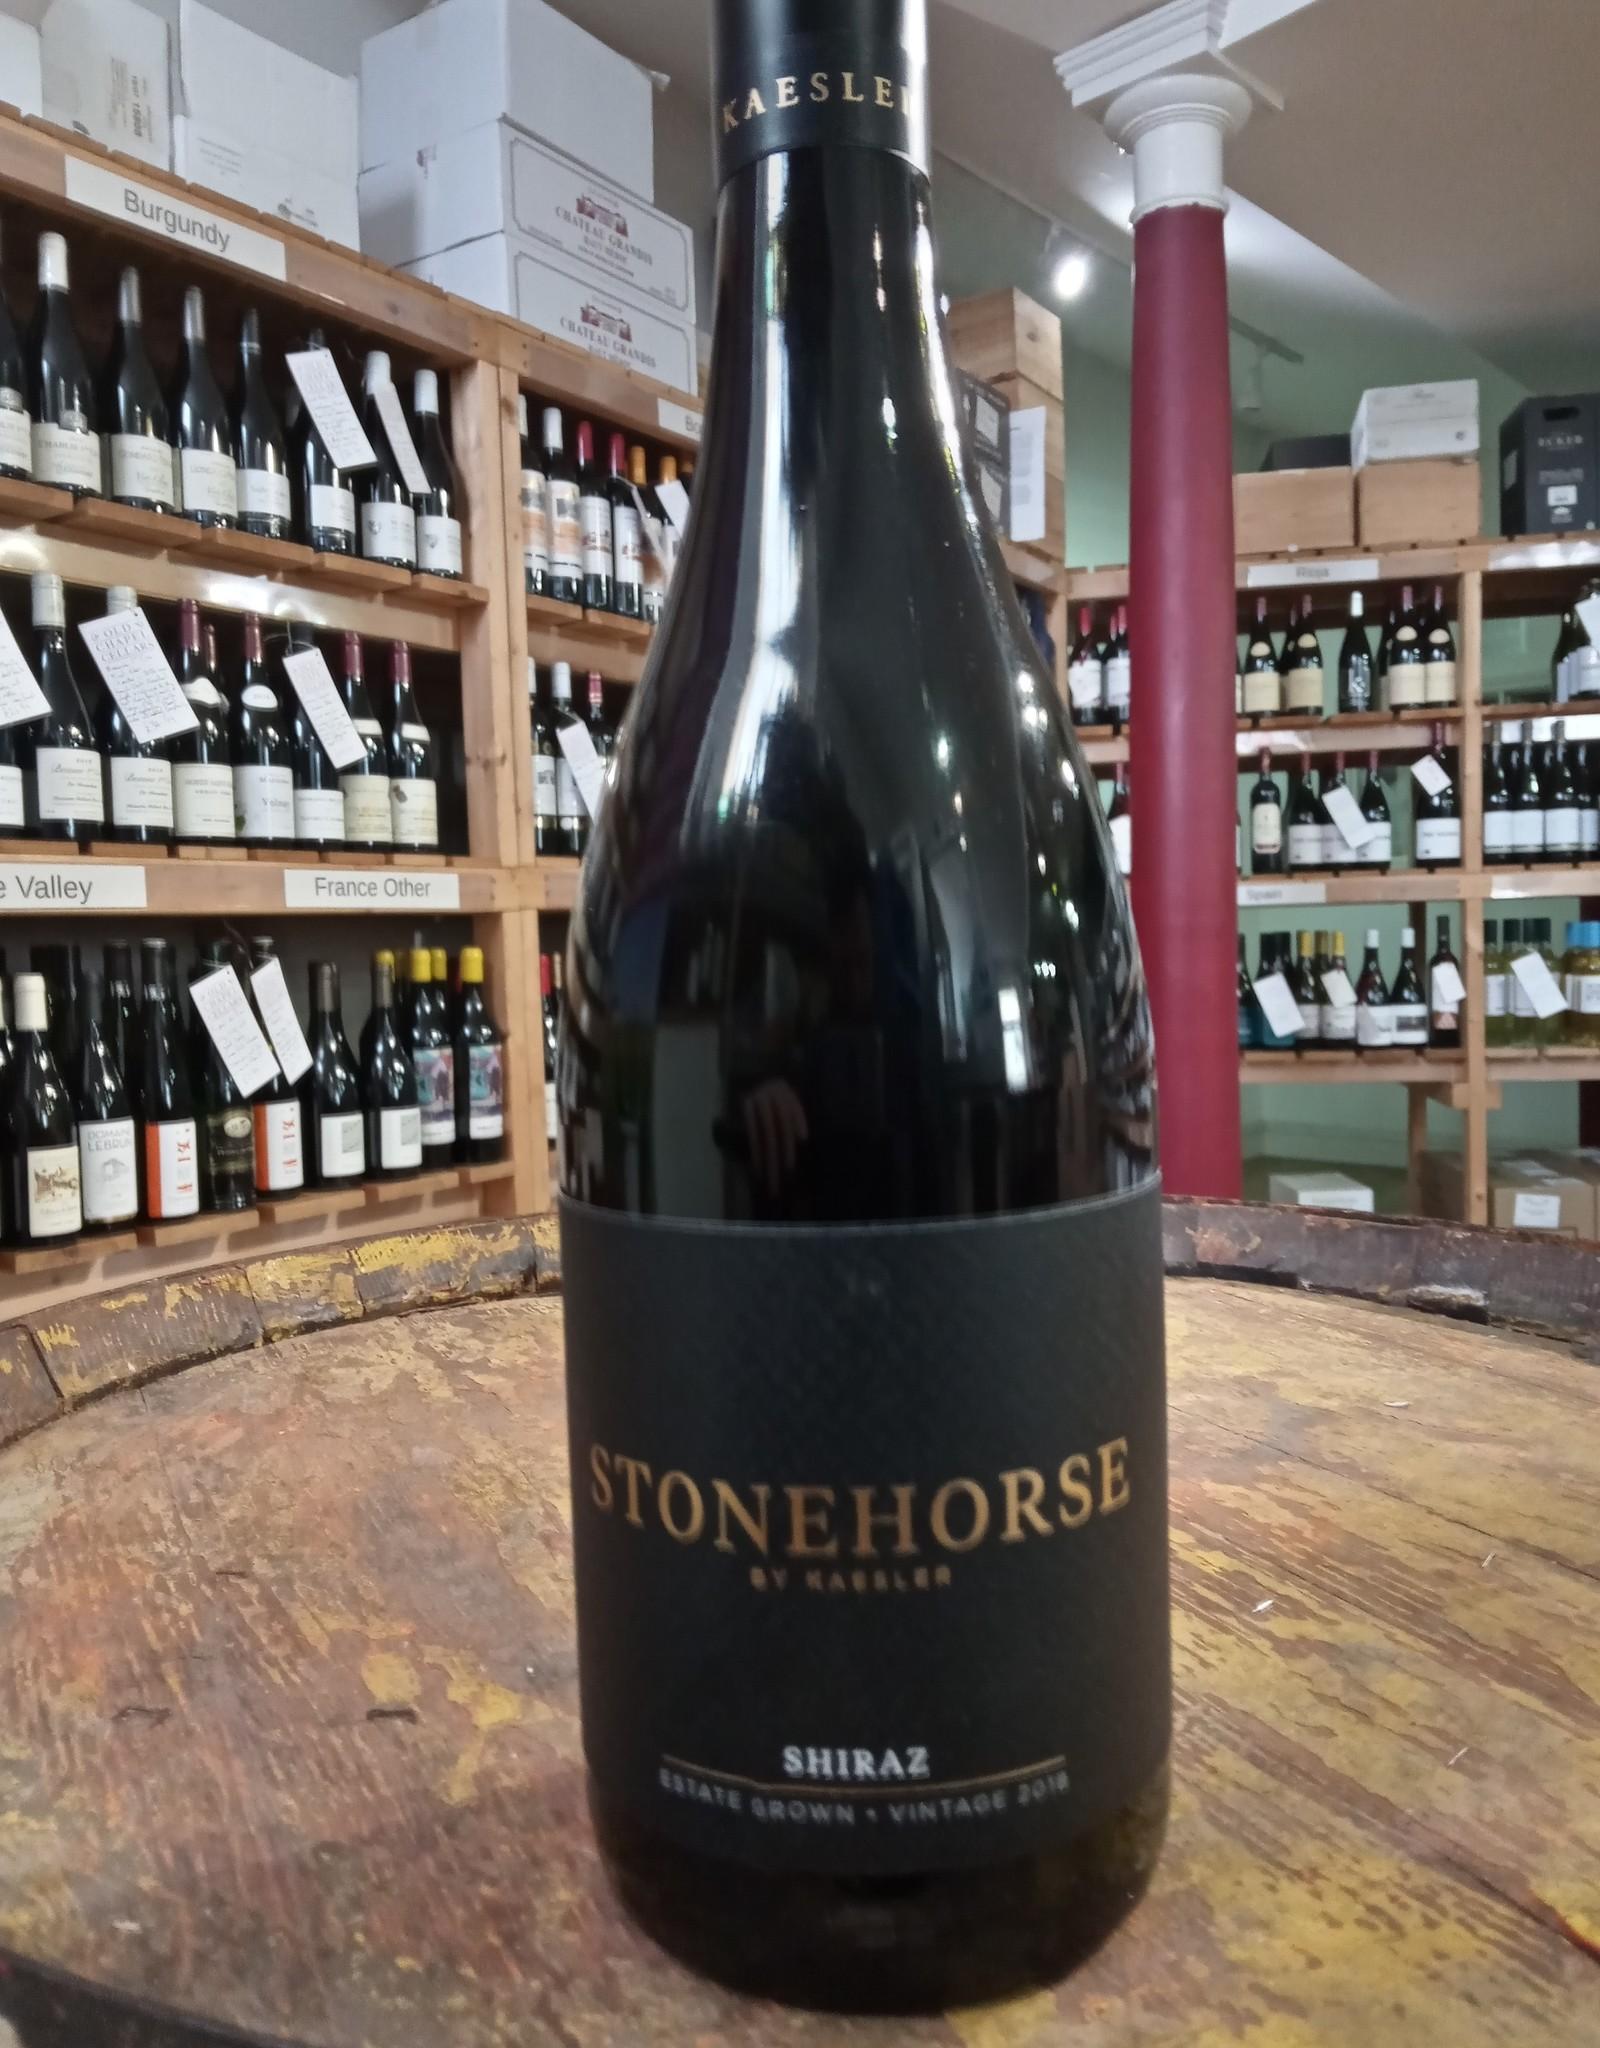 2018 Kaesler Stonehorse Shiraz